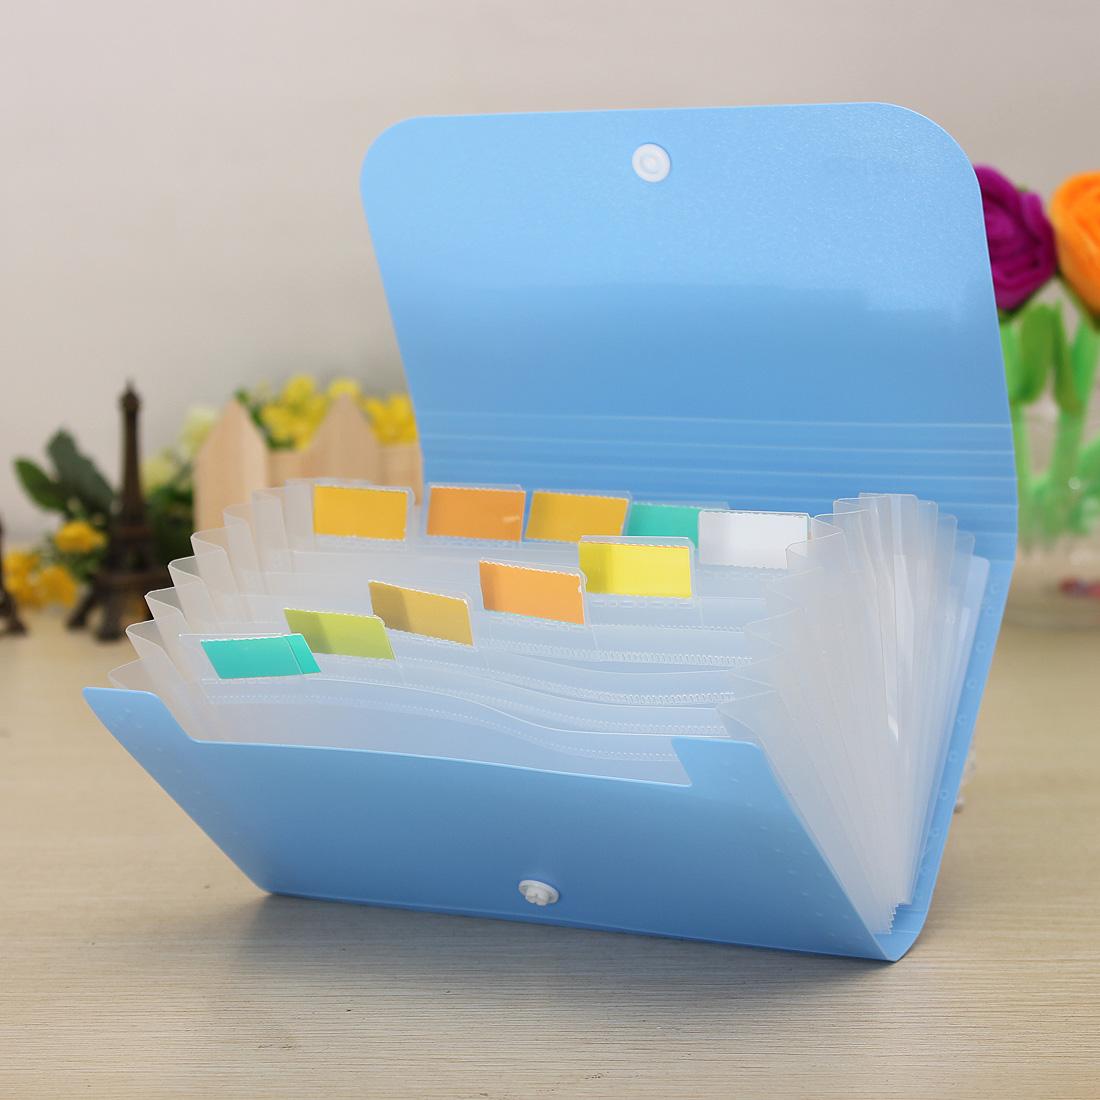 plastic bills receipts file document case bag pouch folder card holder organizer ebay. Black Bedroom Furniture Sets. Home Design Ideas